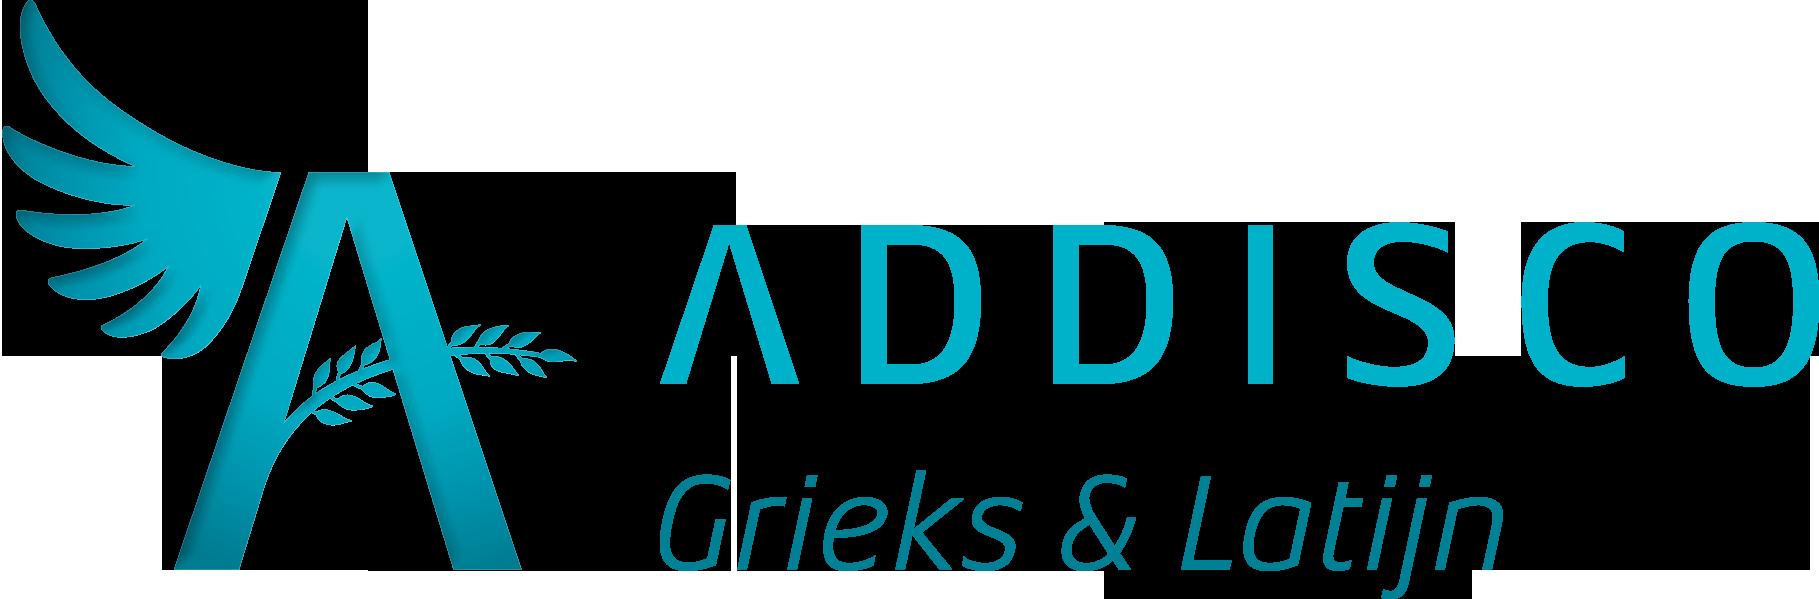 Addisco